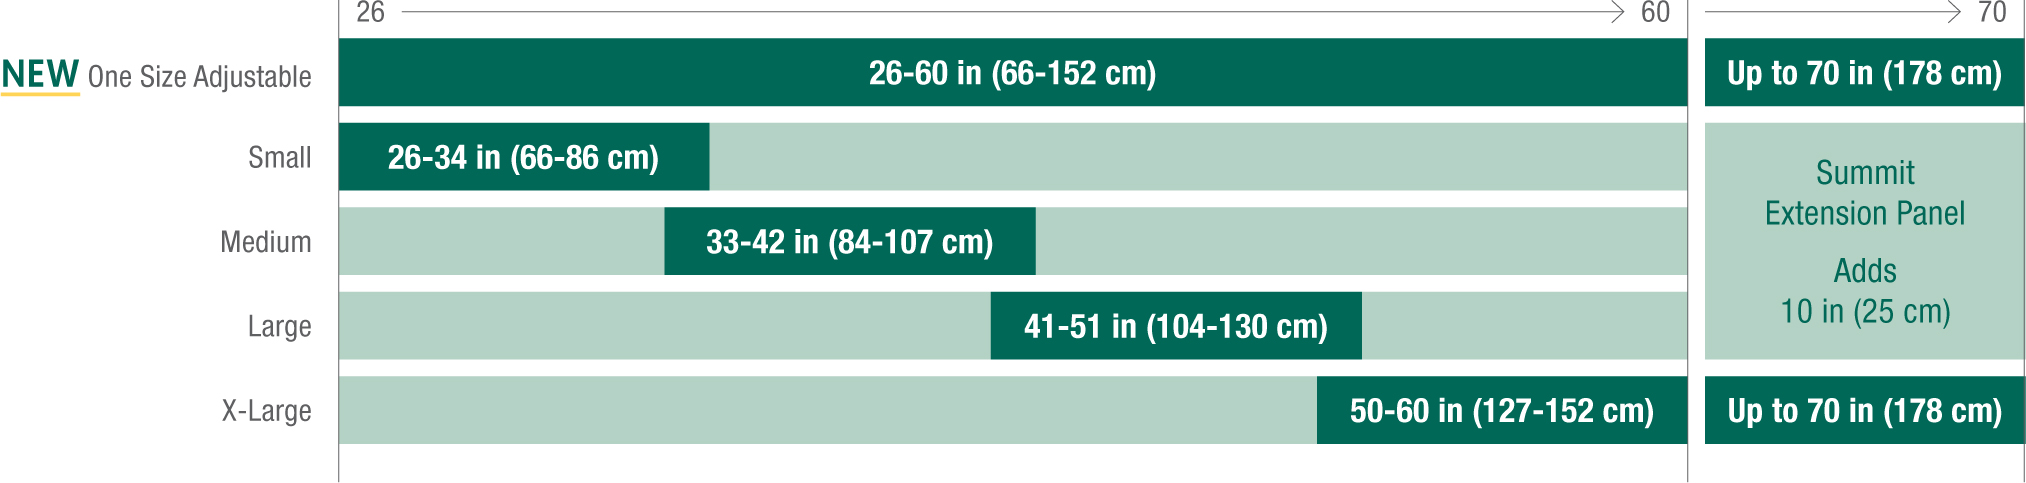 summit-size-chart.jpg